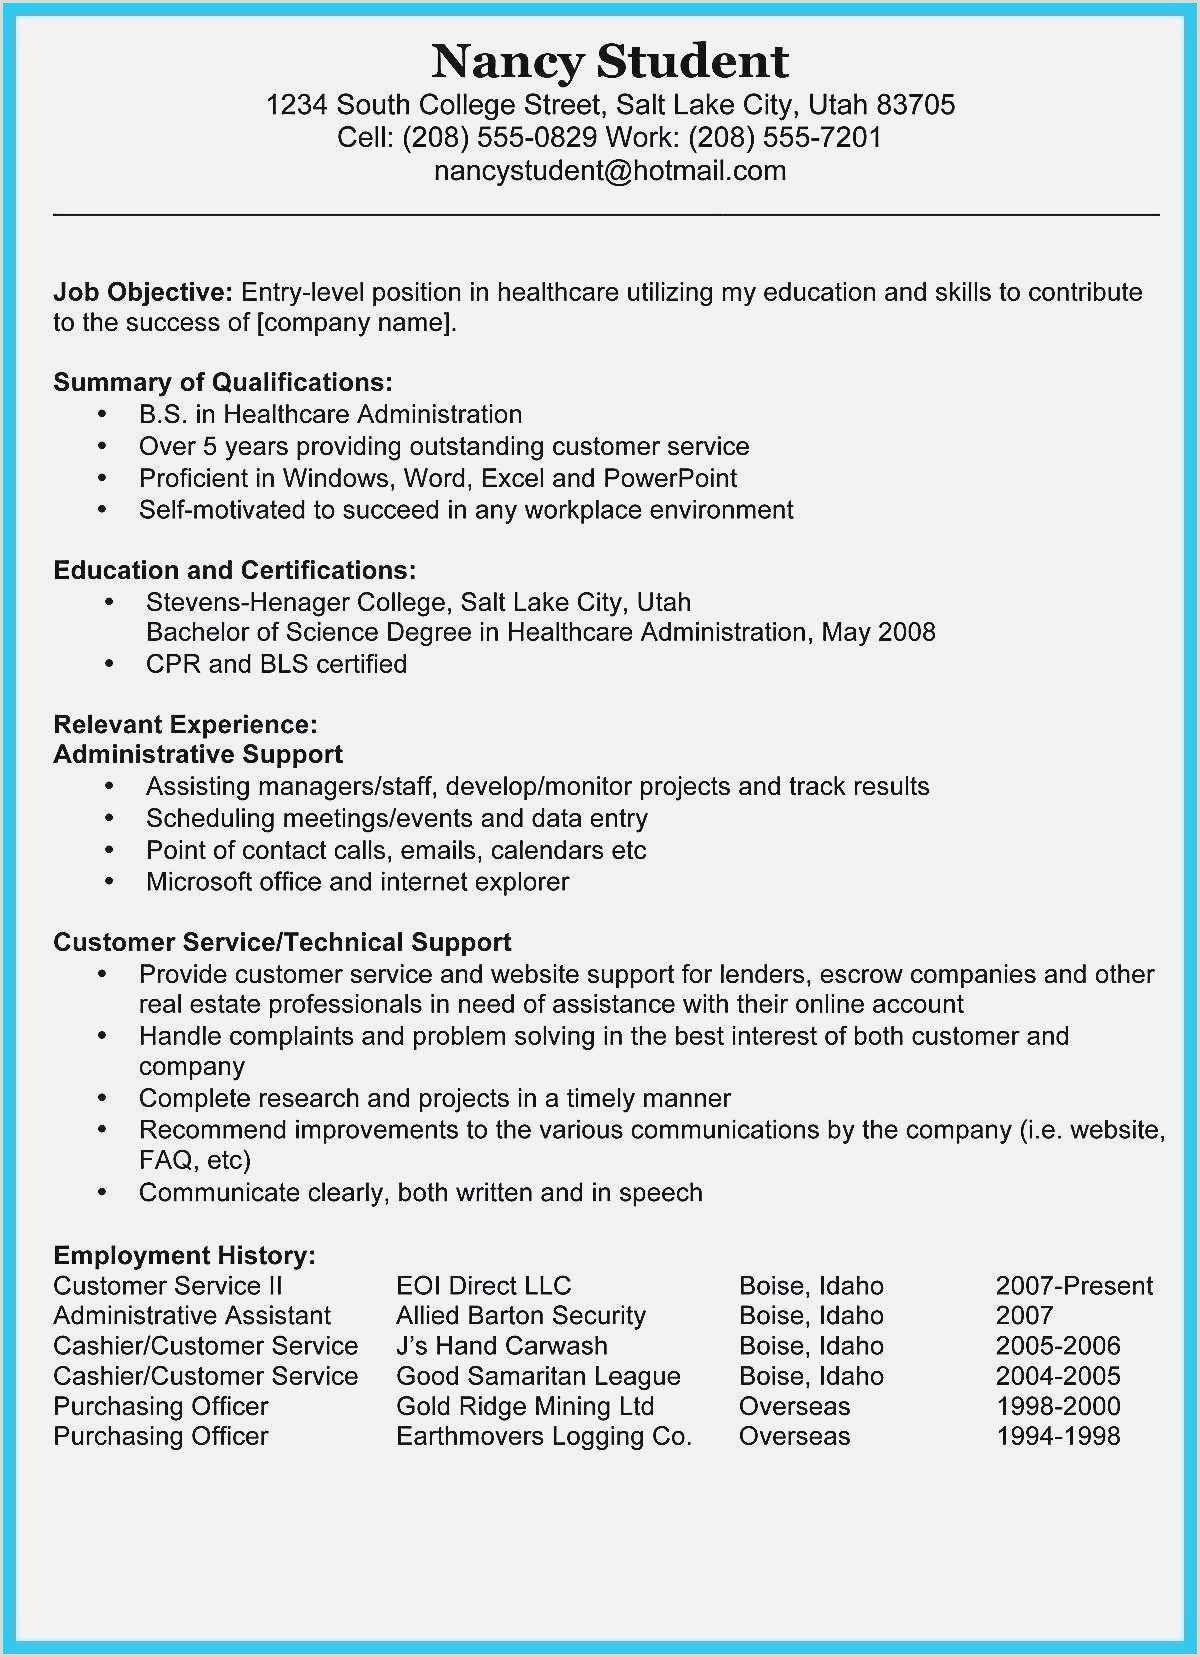 Data Entry Sample Resume Sample resume templates, Resume